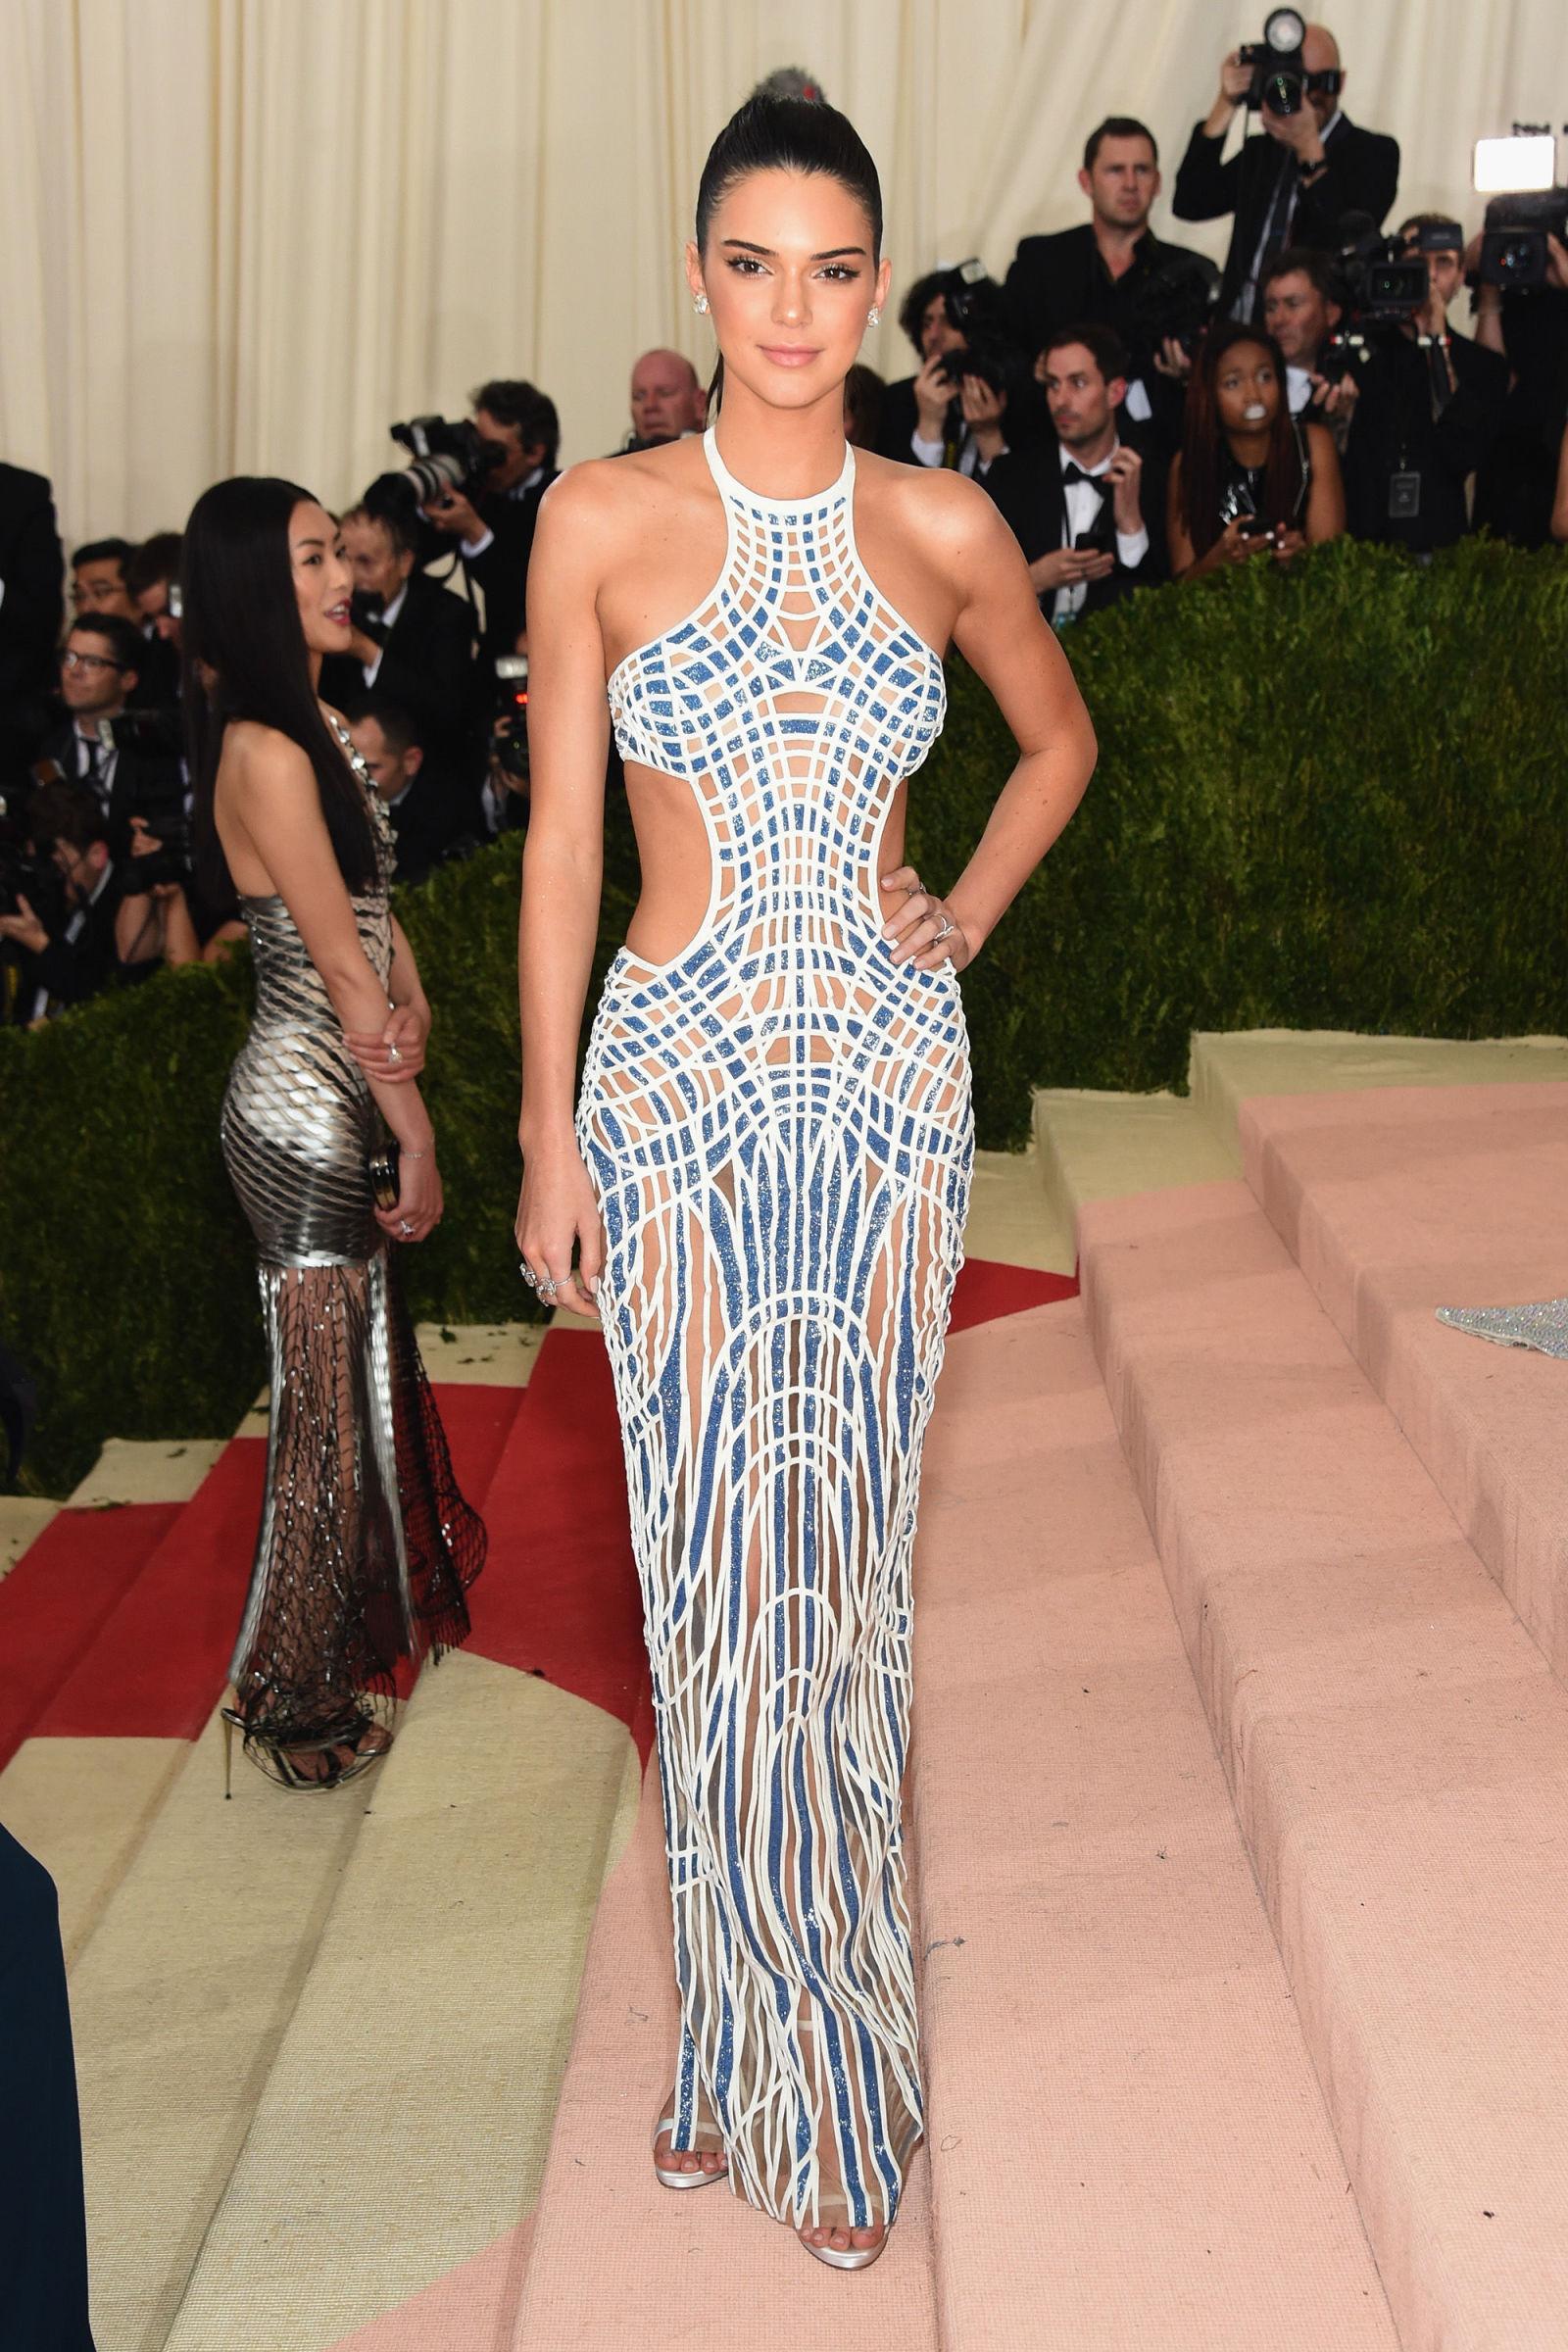 Kendall Jenner hairstyles at Met Gala 2016